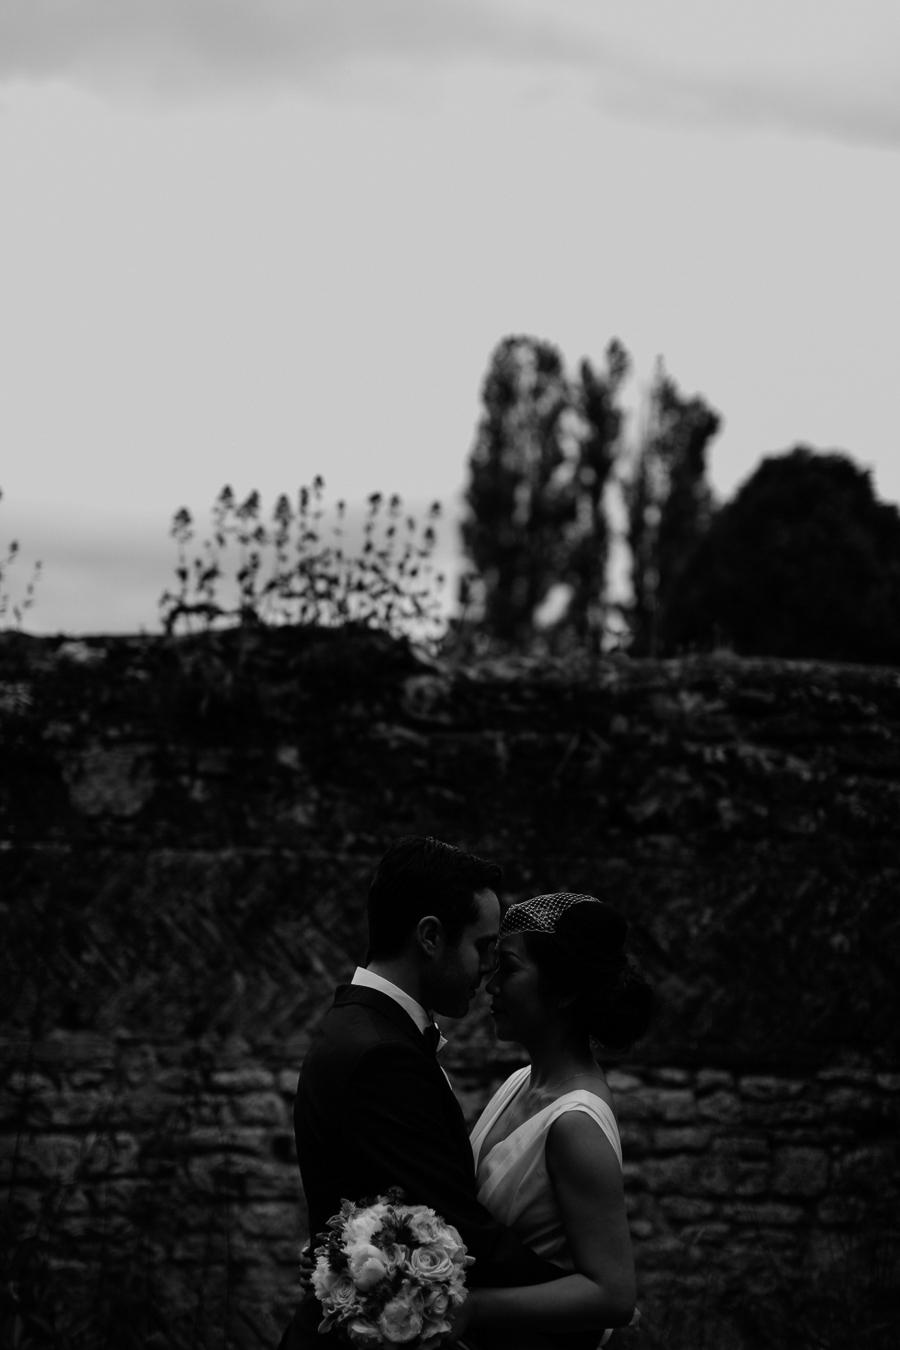 Notley-abbey-buckinghamshire-england-wedding-abi-q-photography--167.jpg